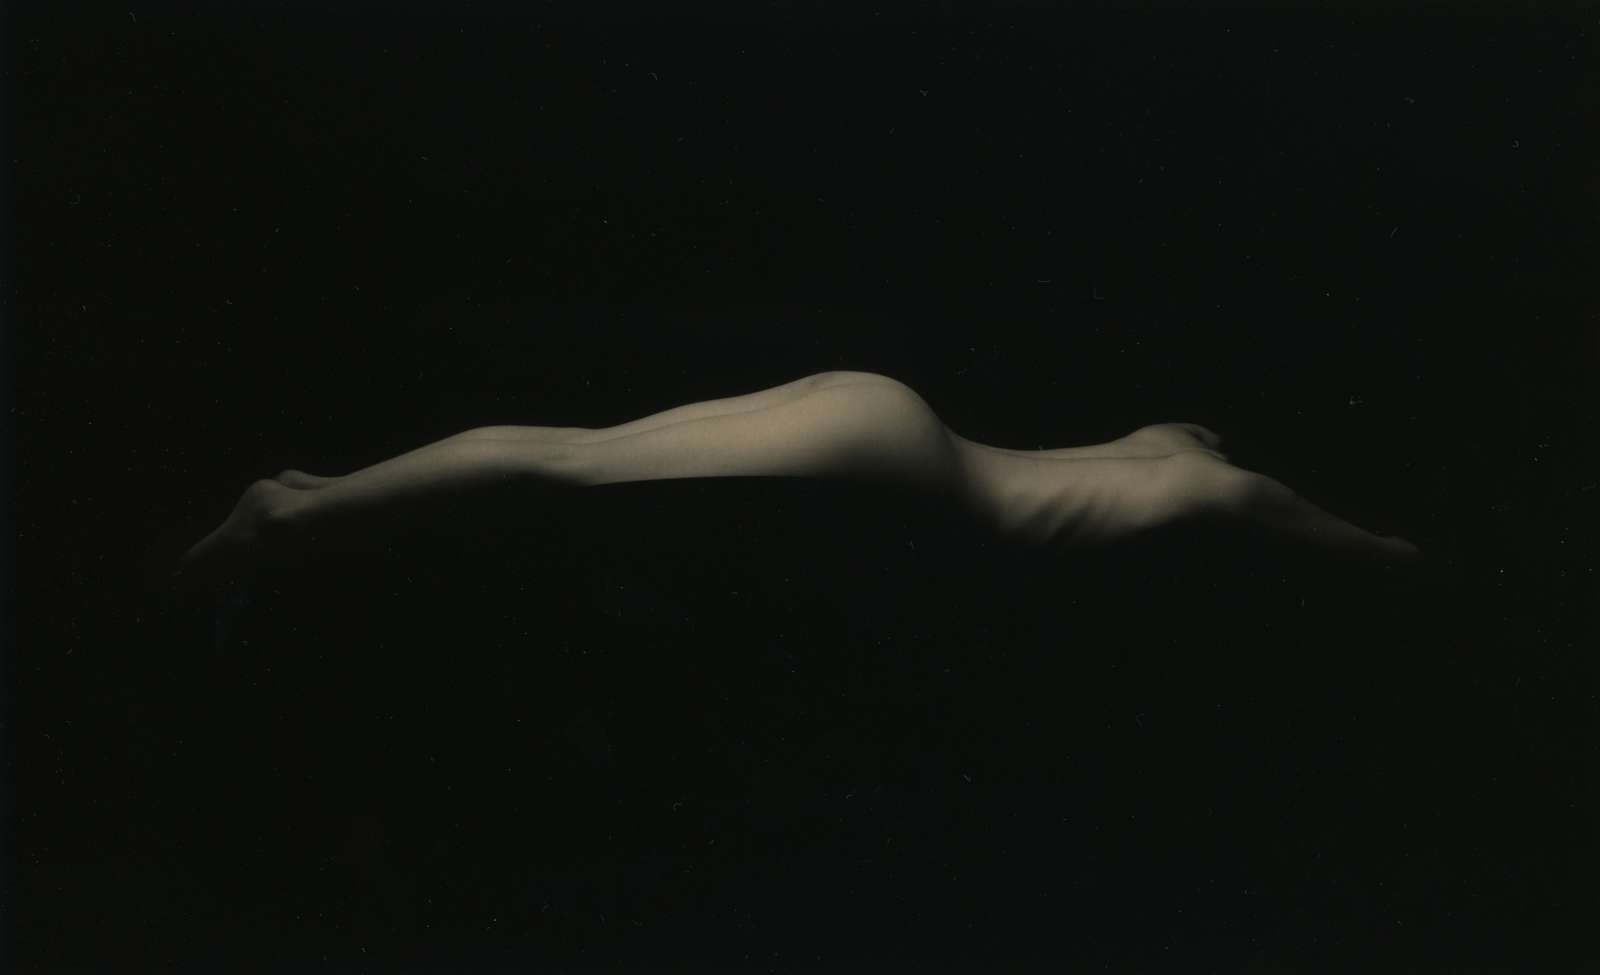 Masao Yamamoto's Poetic Photography Debuts in Canada